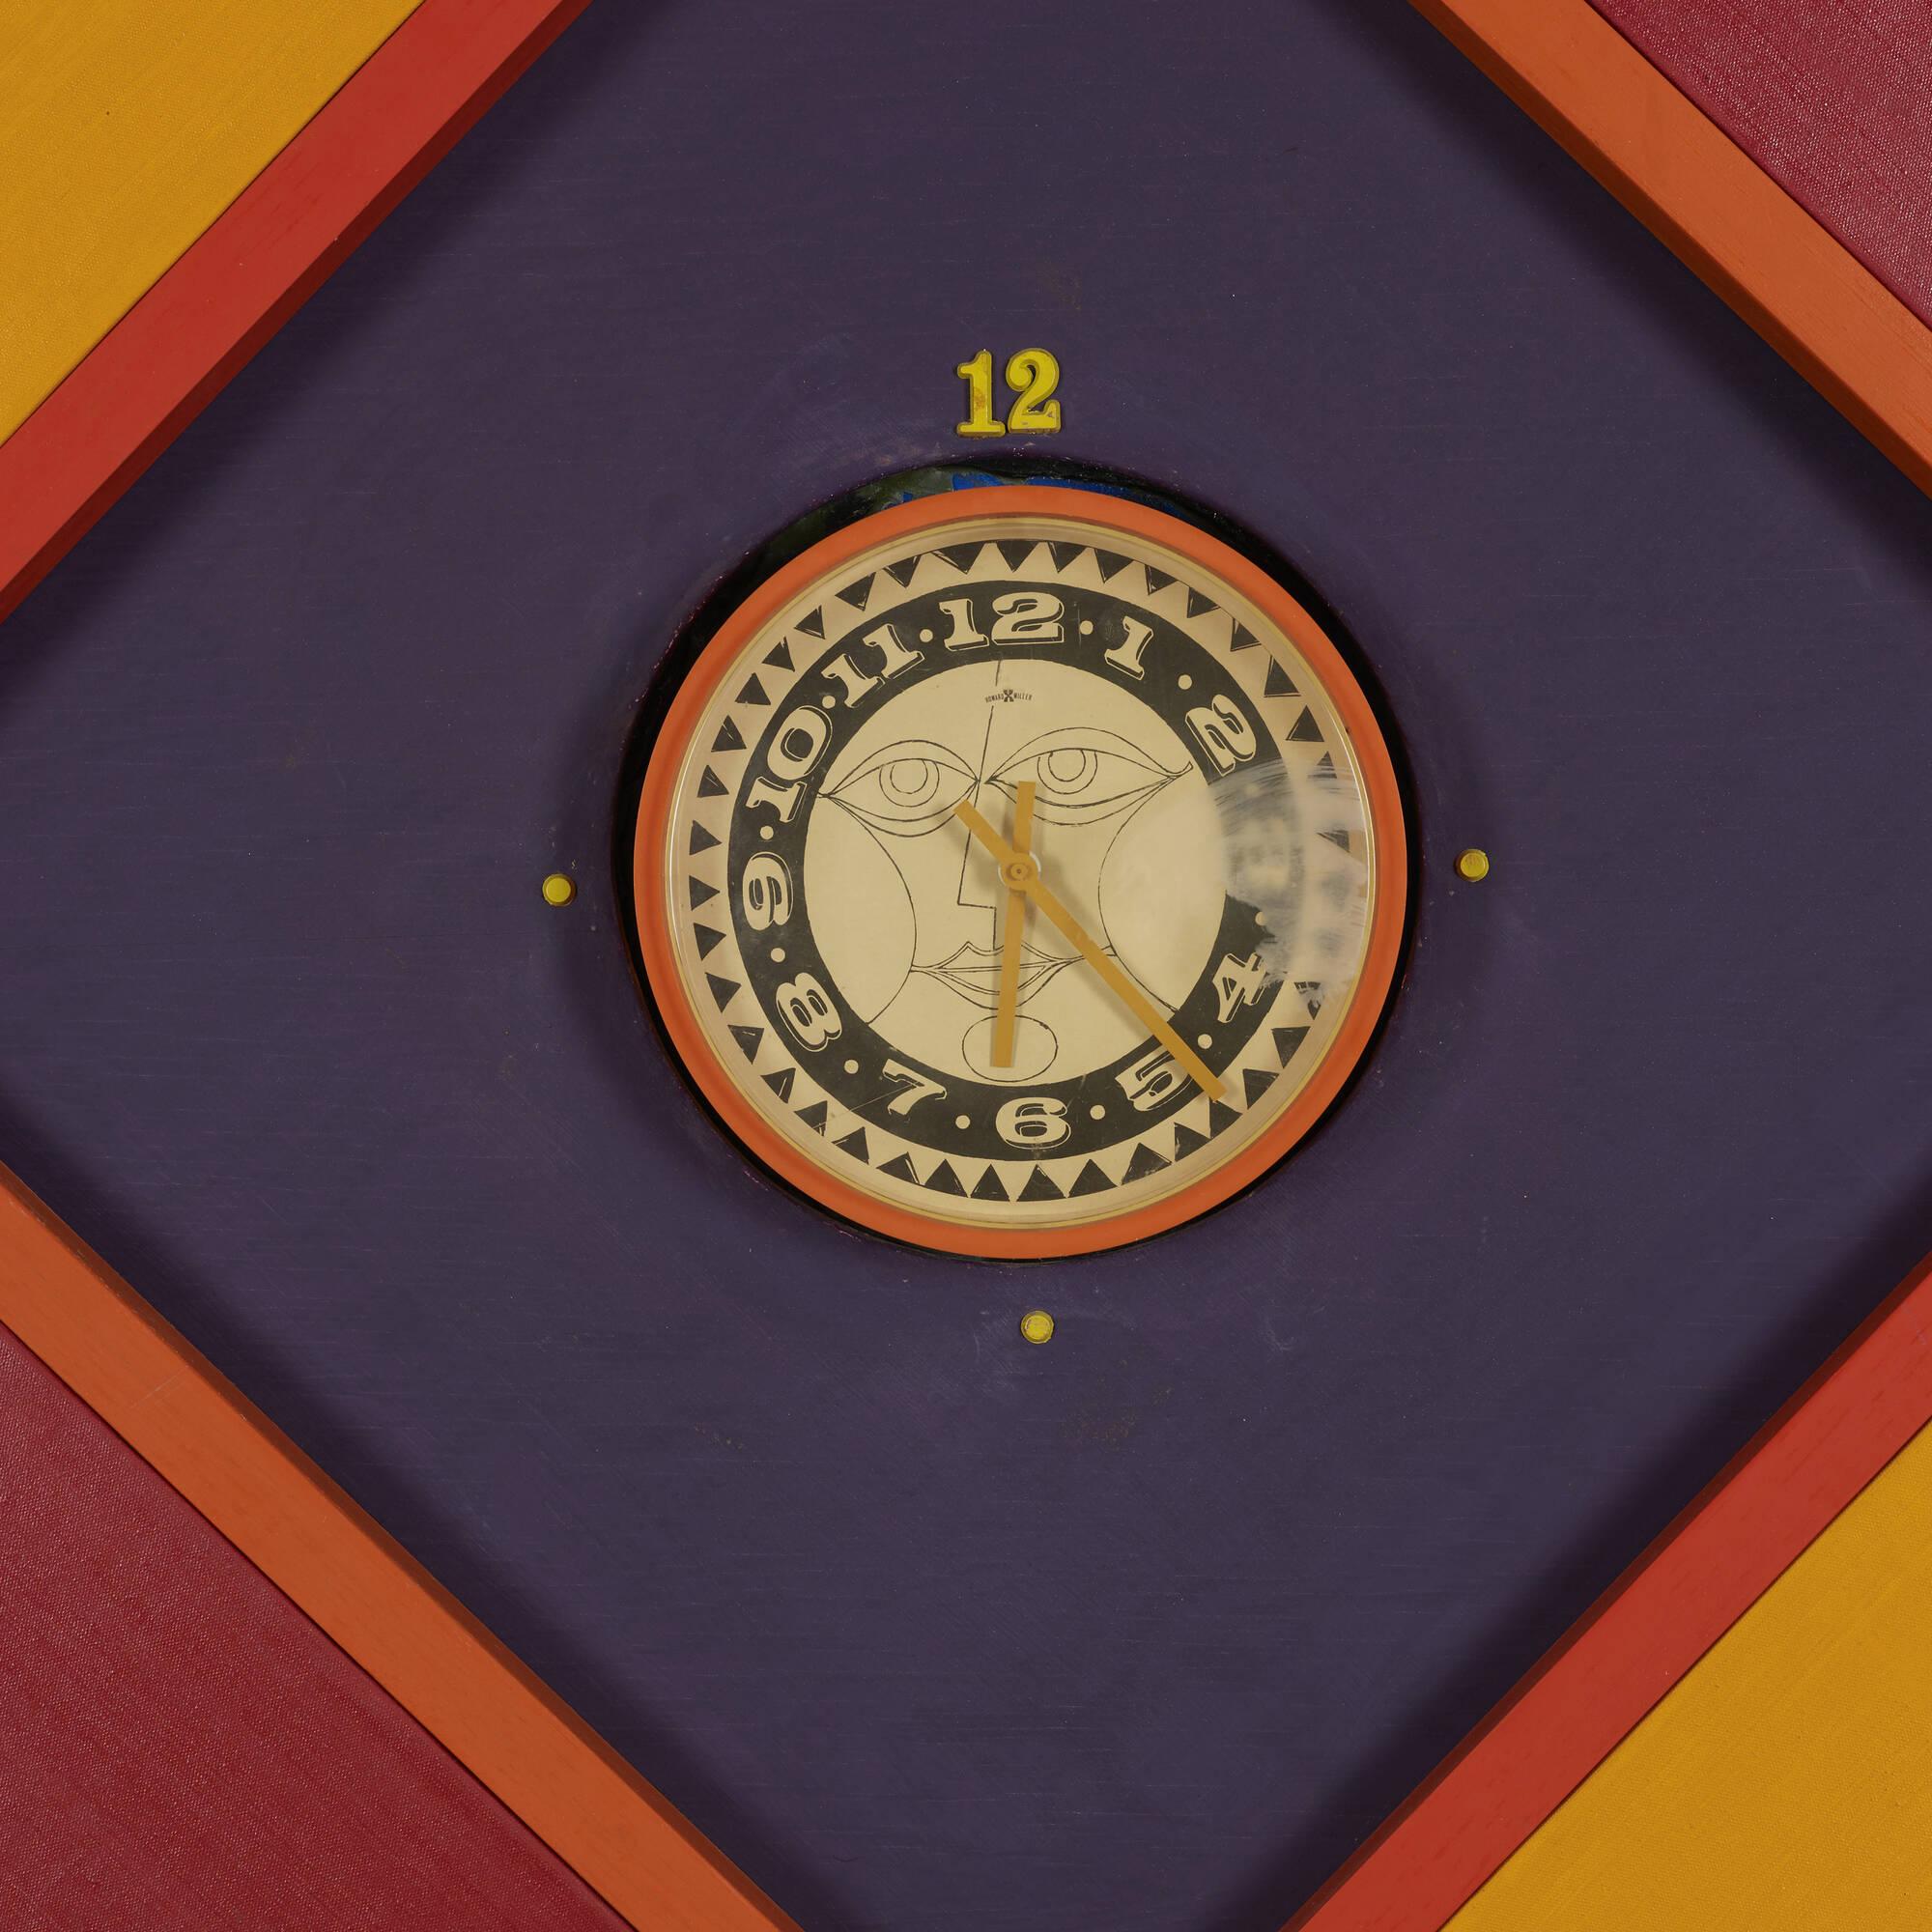 308: Alexander Girard, attribution / monumental wall clock (2 of 3)